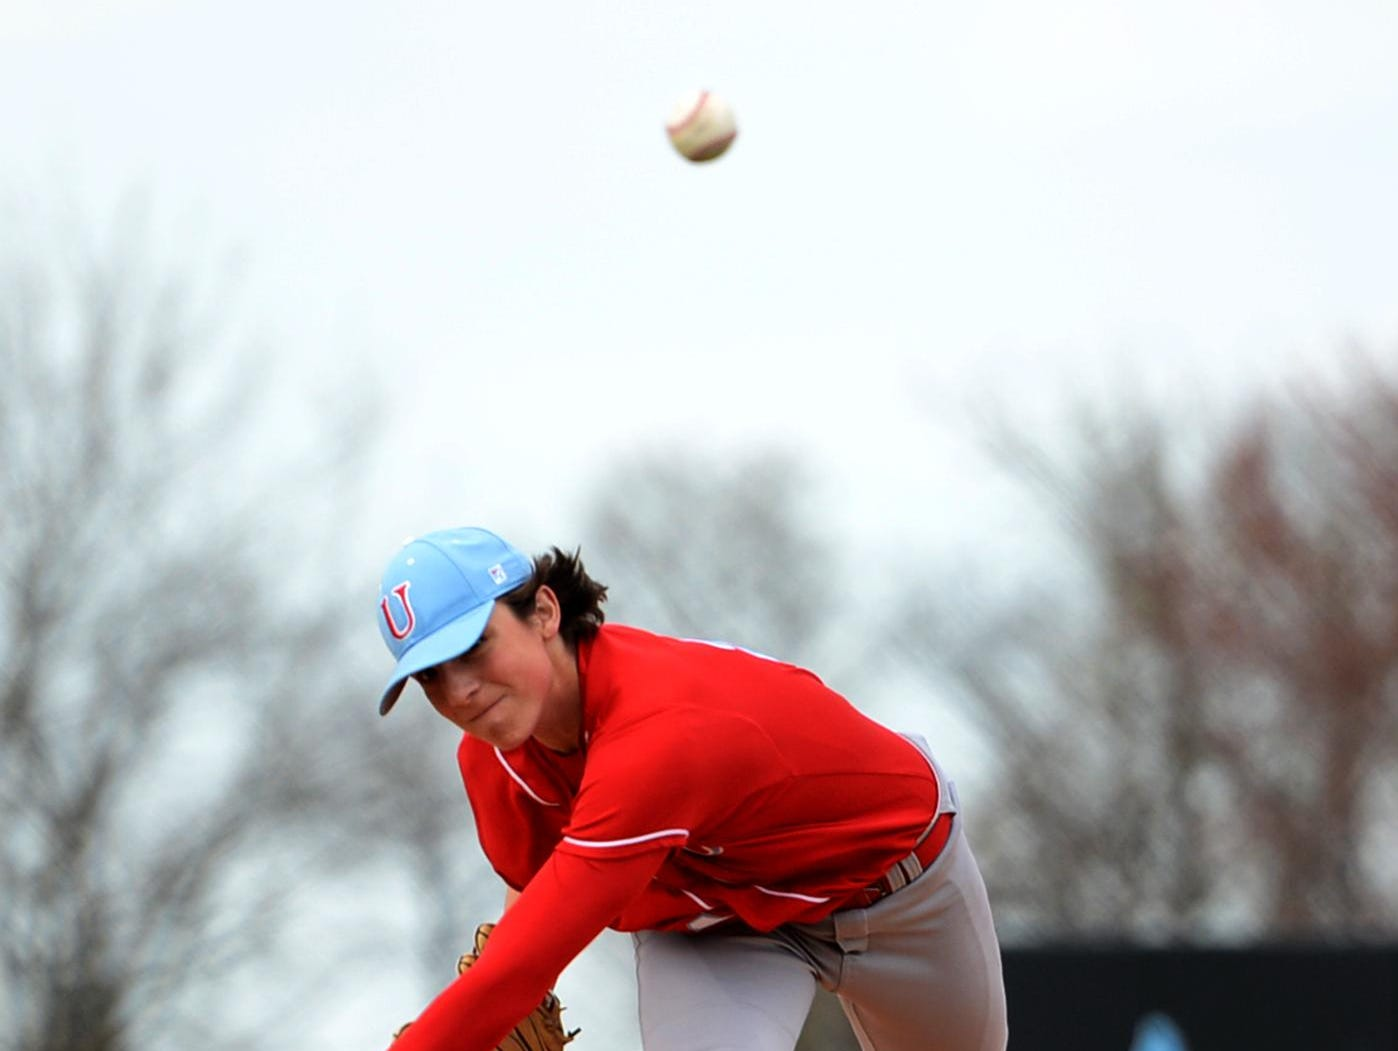 USJ rising senior Ryan Rolison is competing for one of 20 spots on the USA Baseball U18 national team.